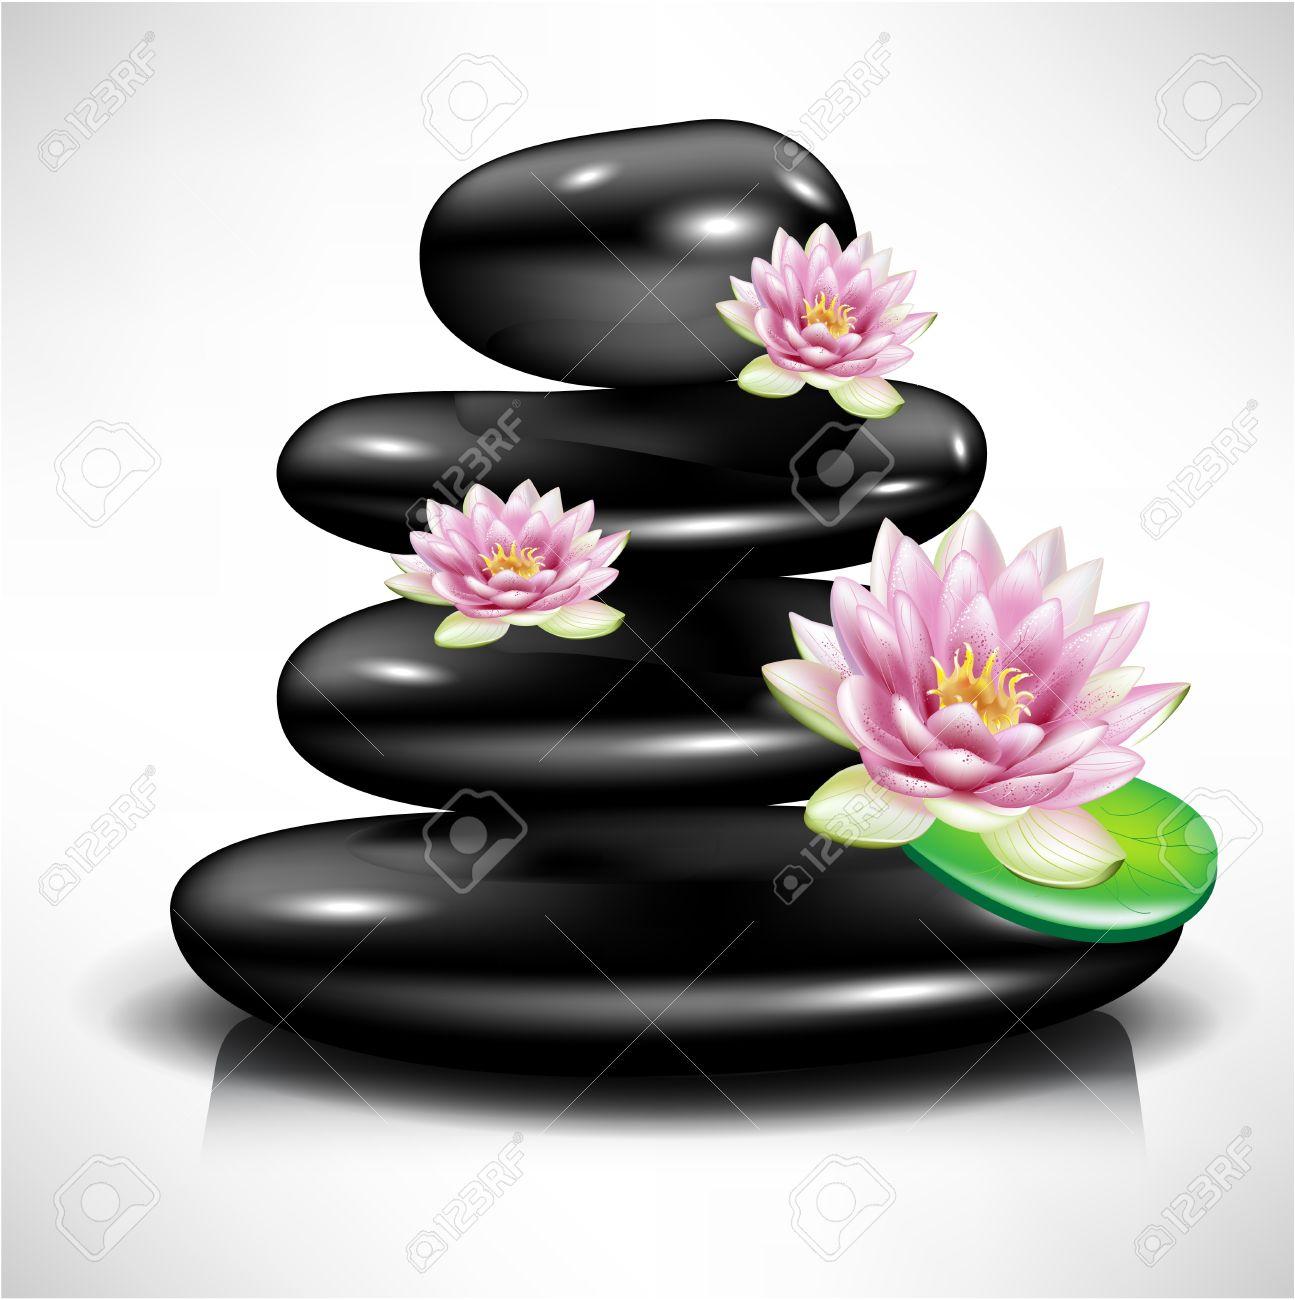 Single spa stonepebble with lotus flowers royalty free cliparts single spa stonepebble with lotus flowers stock vector 10959853 izmirmasajfo Gallery